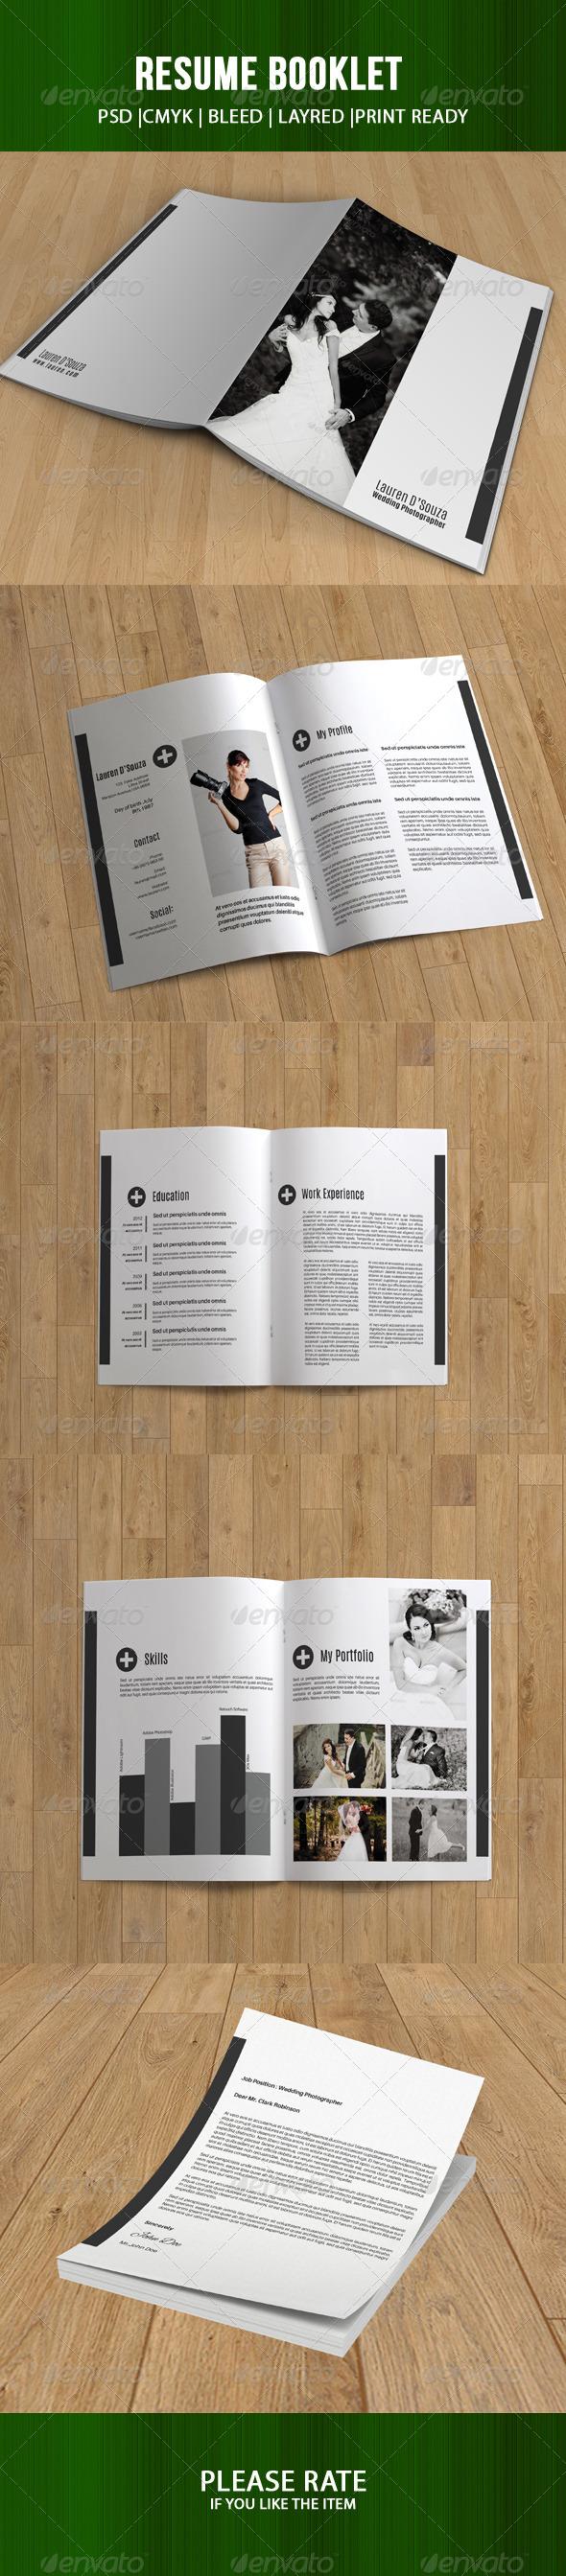 Resume And Portfolio Booklet-V03